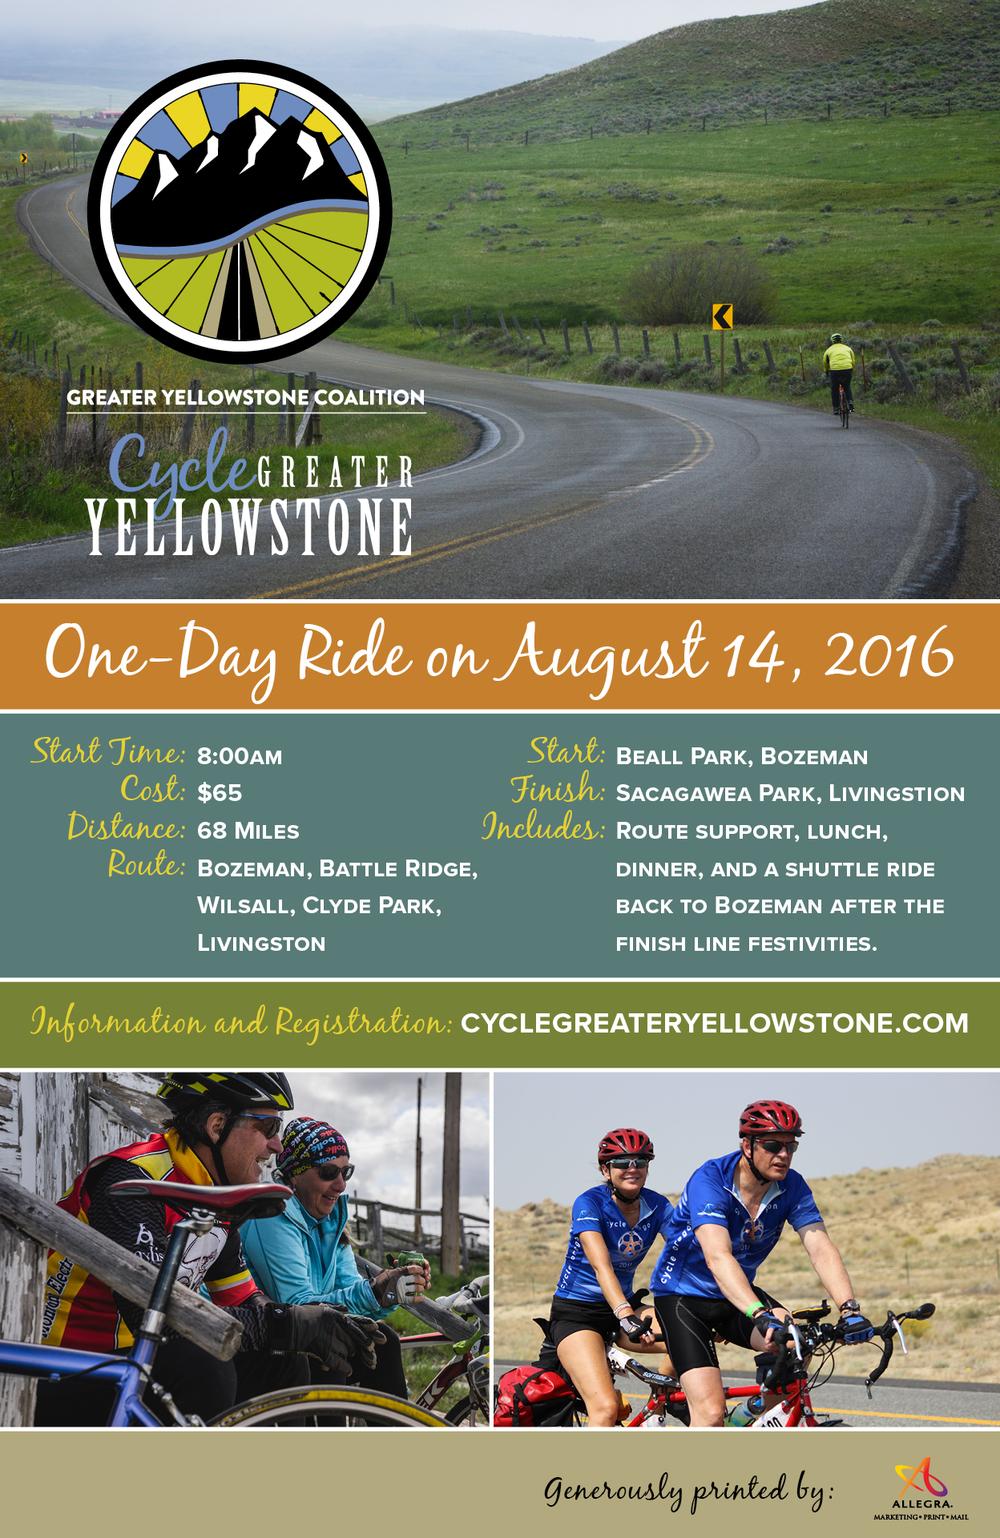 August 14:  68 miles; Bozeman, Battle ridege, Wilsall, Clyde park and Livingston.